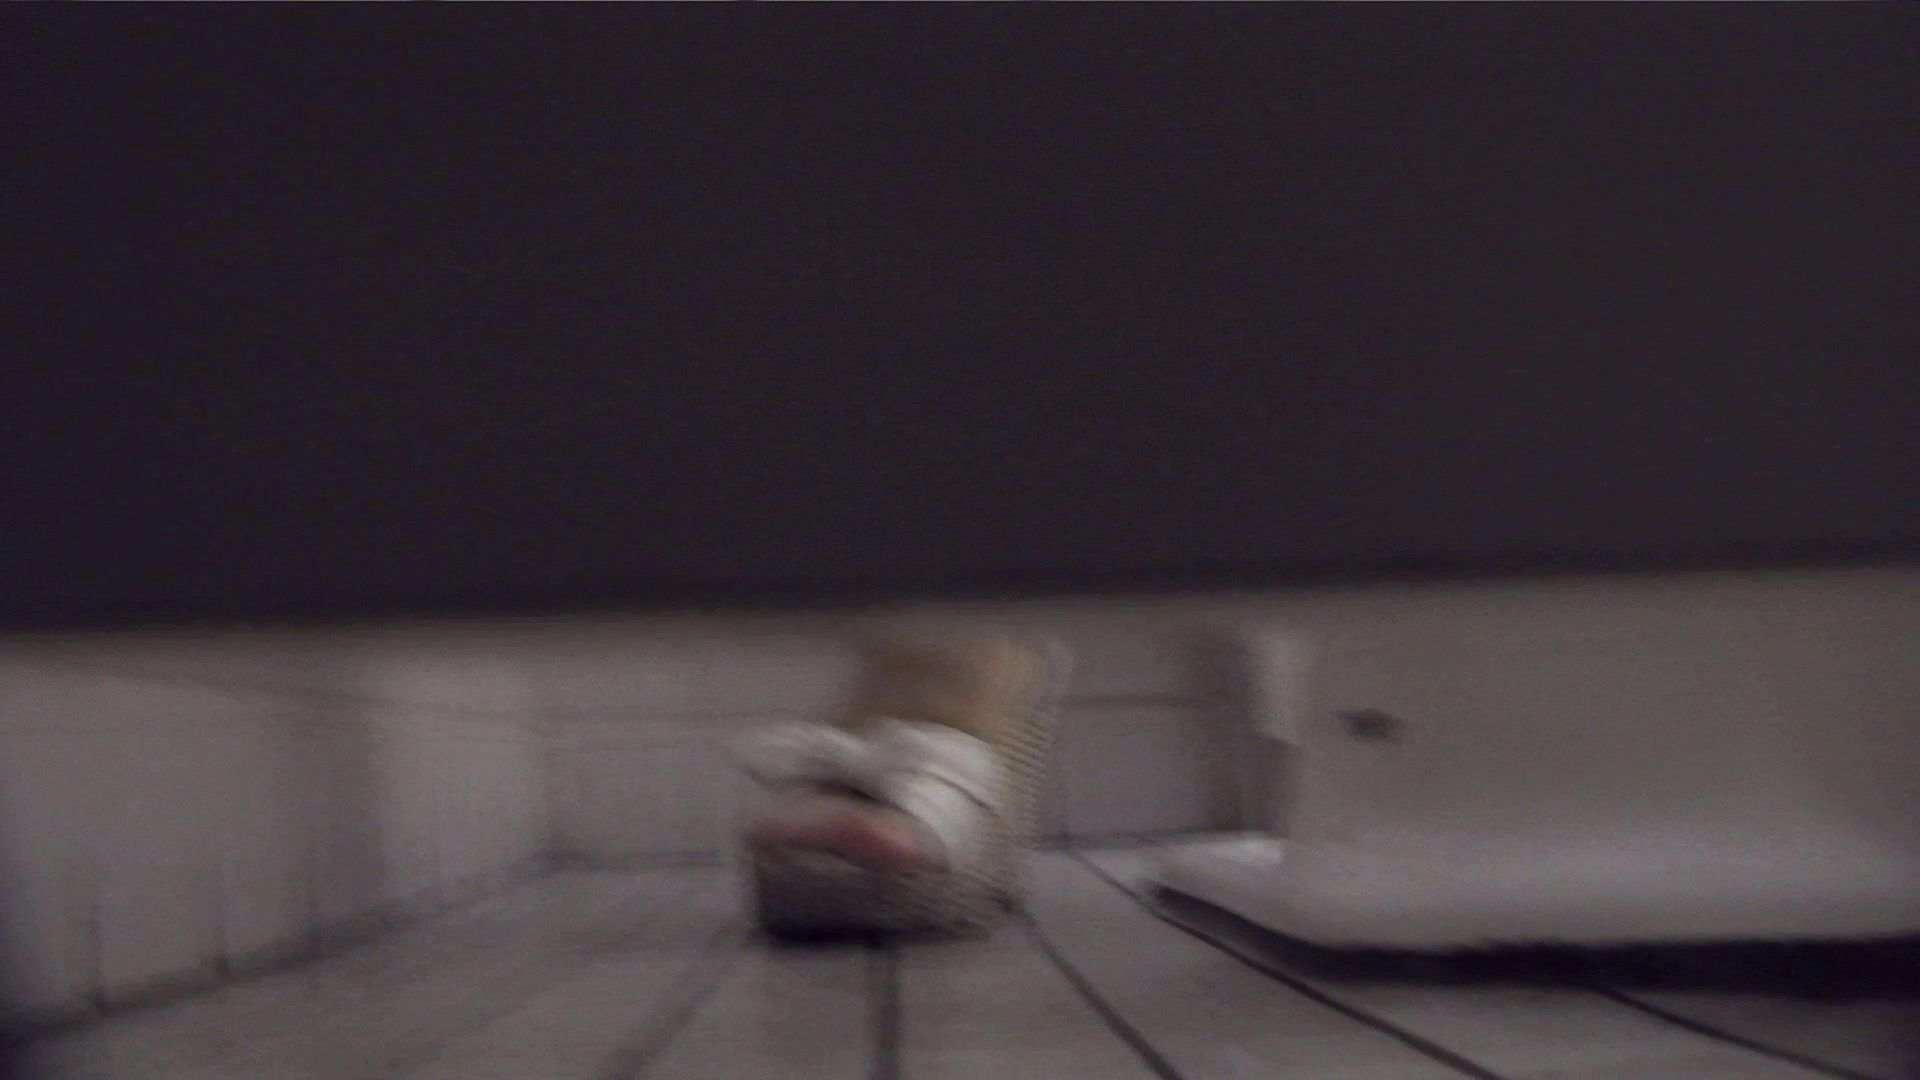 vol.06 命がけ潜伏洗面所! ツン!とした子は割と几帳面? 洗面所 おめこ無修正動画無料 108連発 78